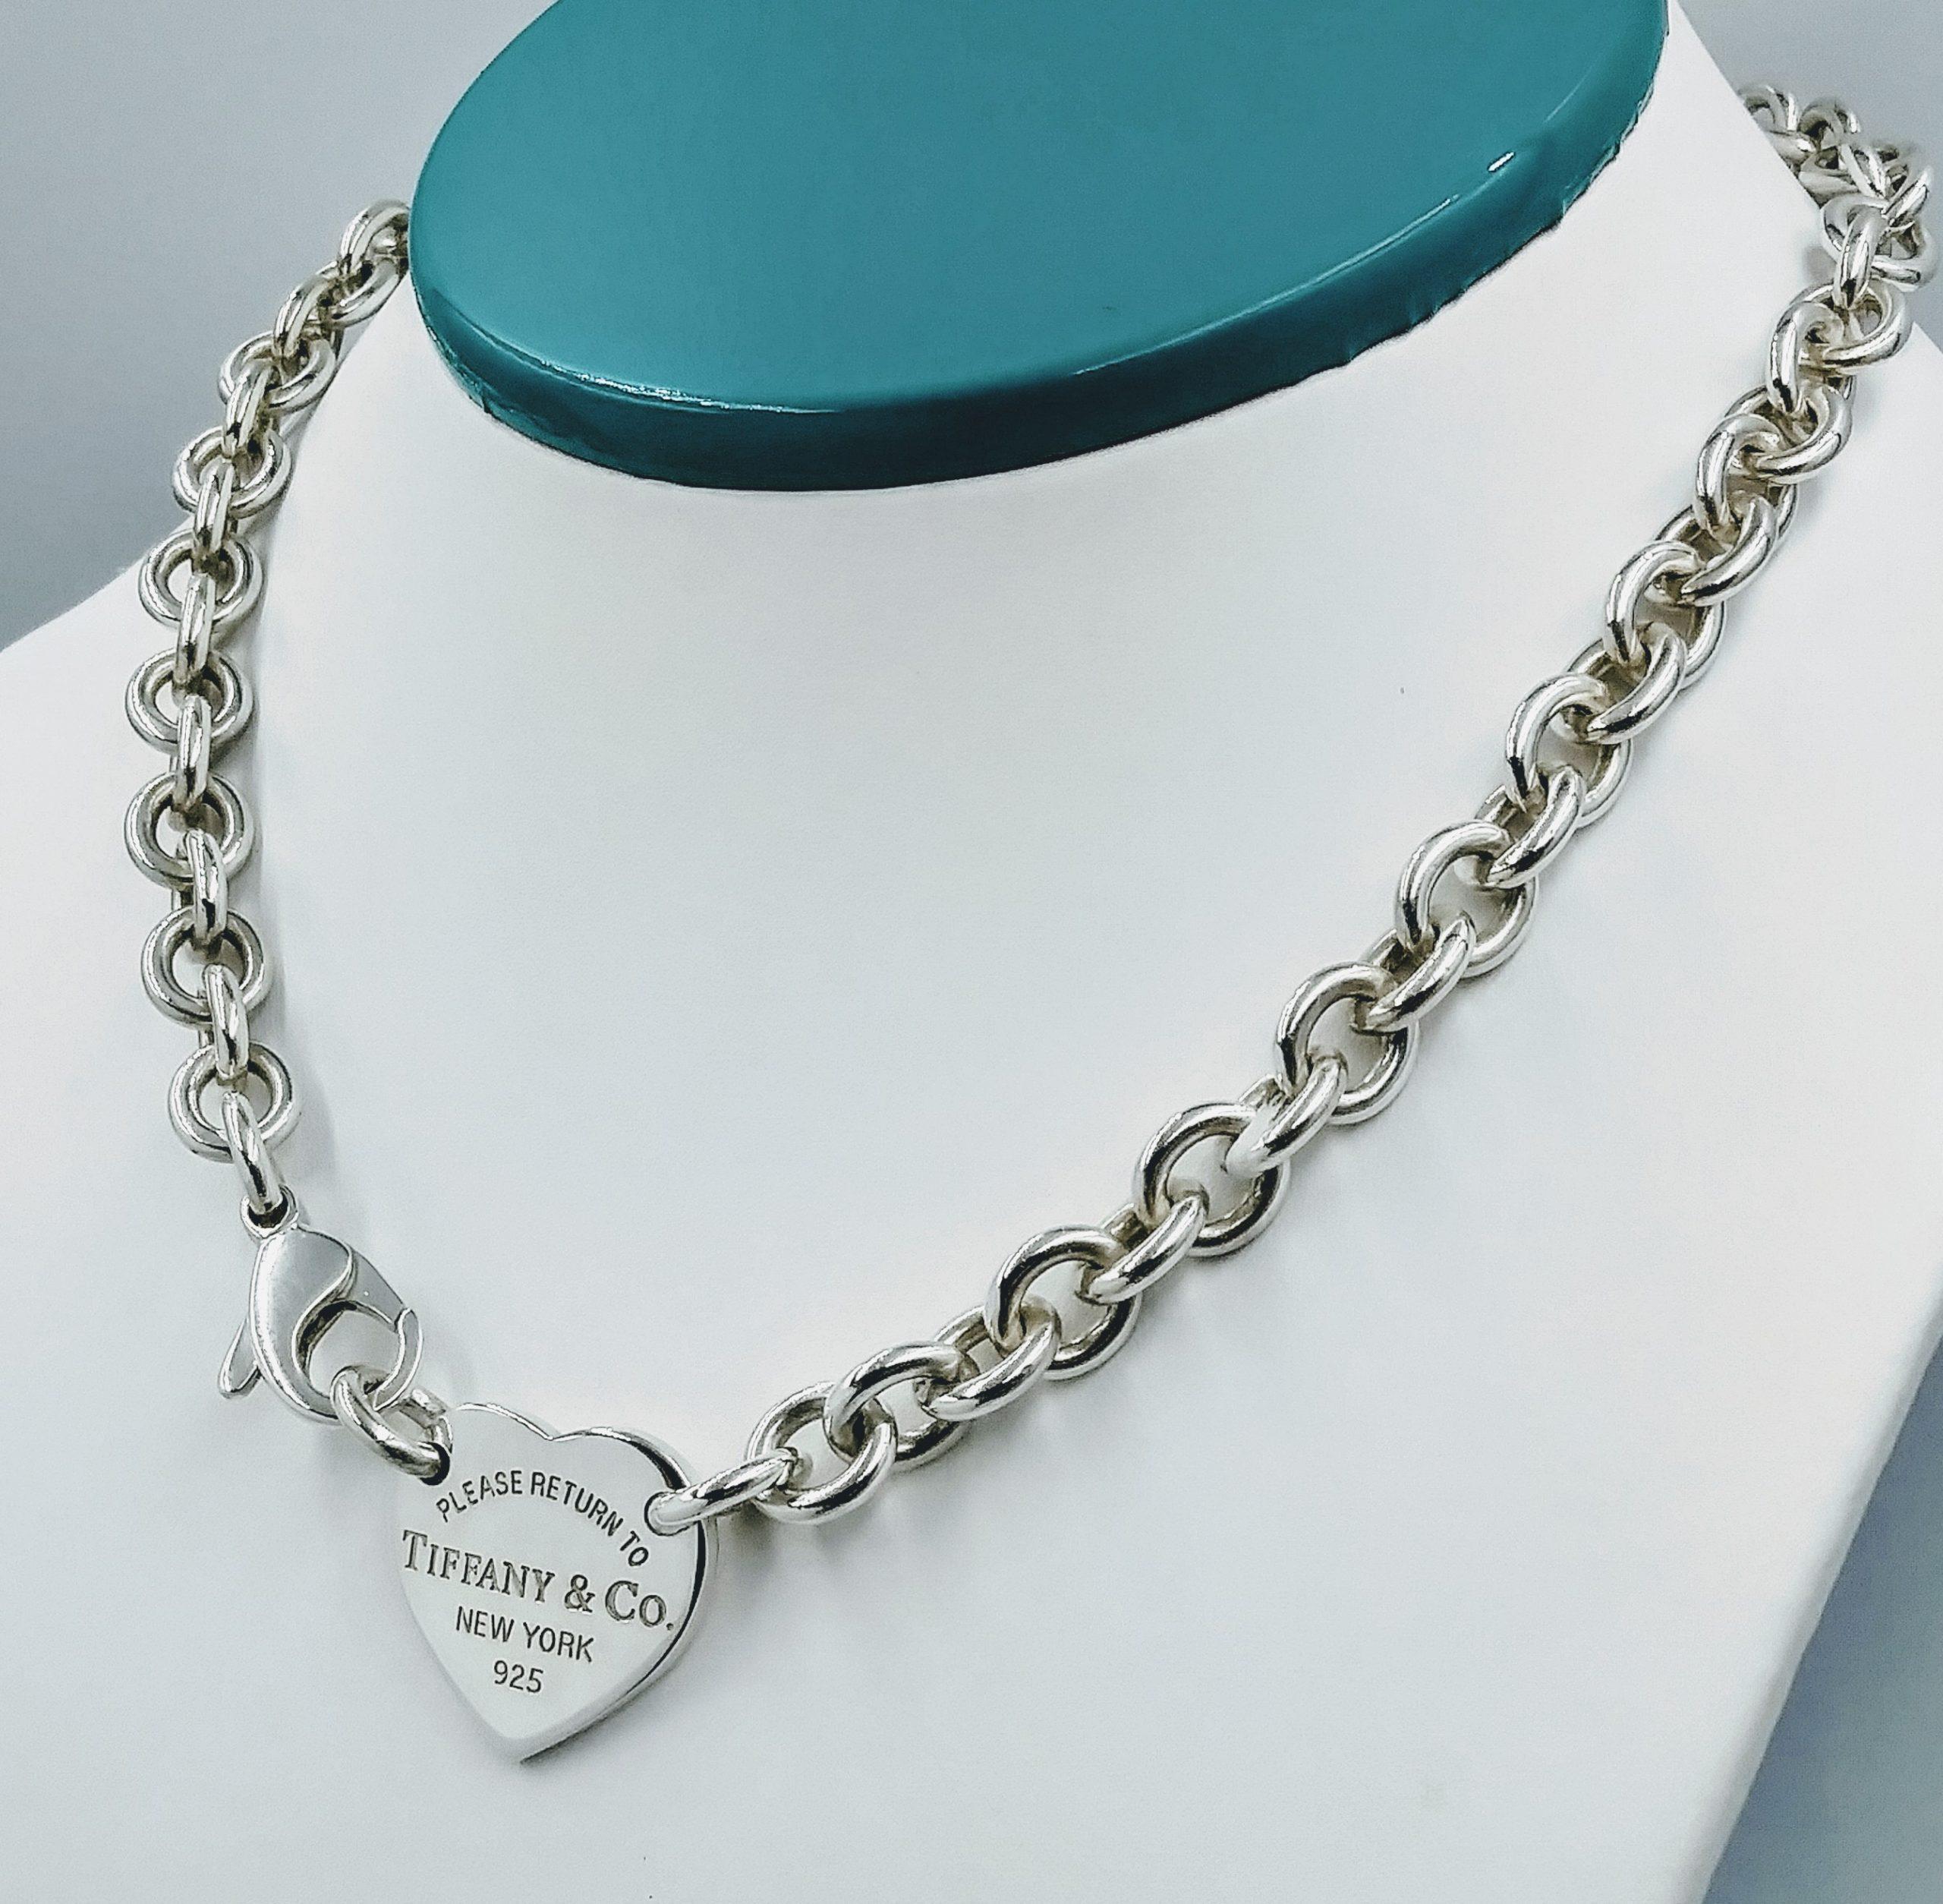 Tiffany Co 18 Please Return To Tiffany Co Heart Tag Choker Necklace Smartshop Jewelry